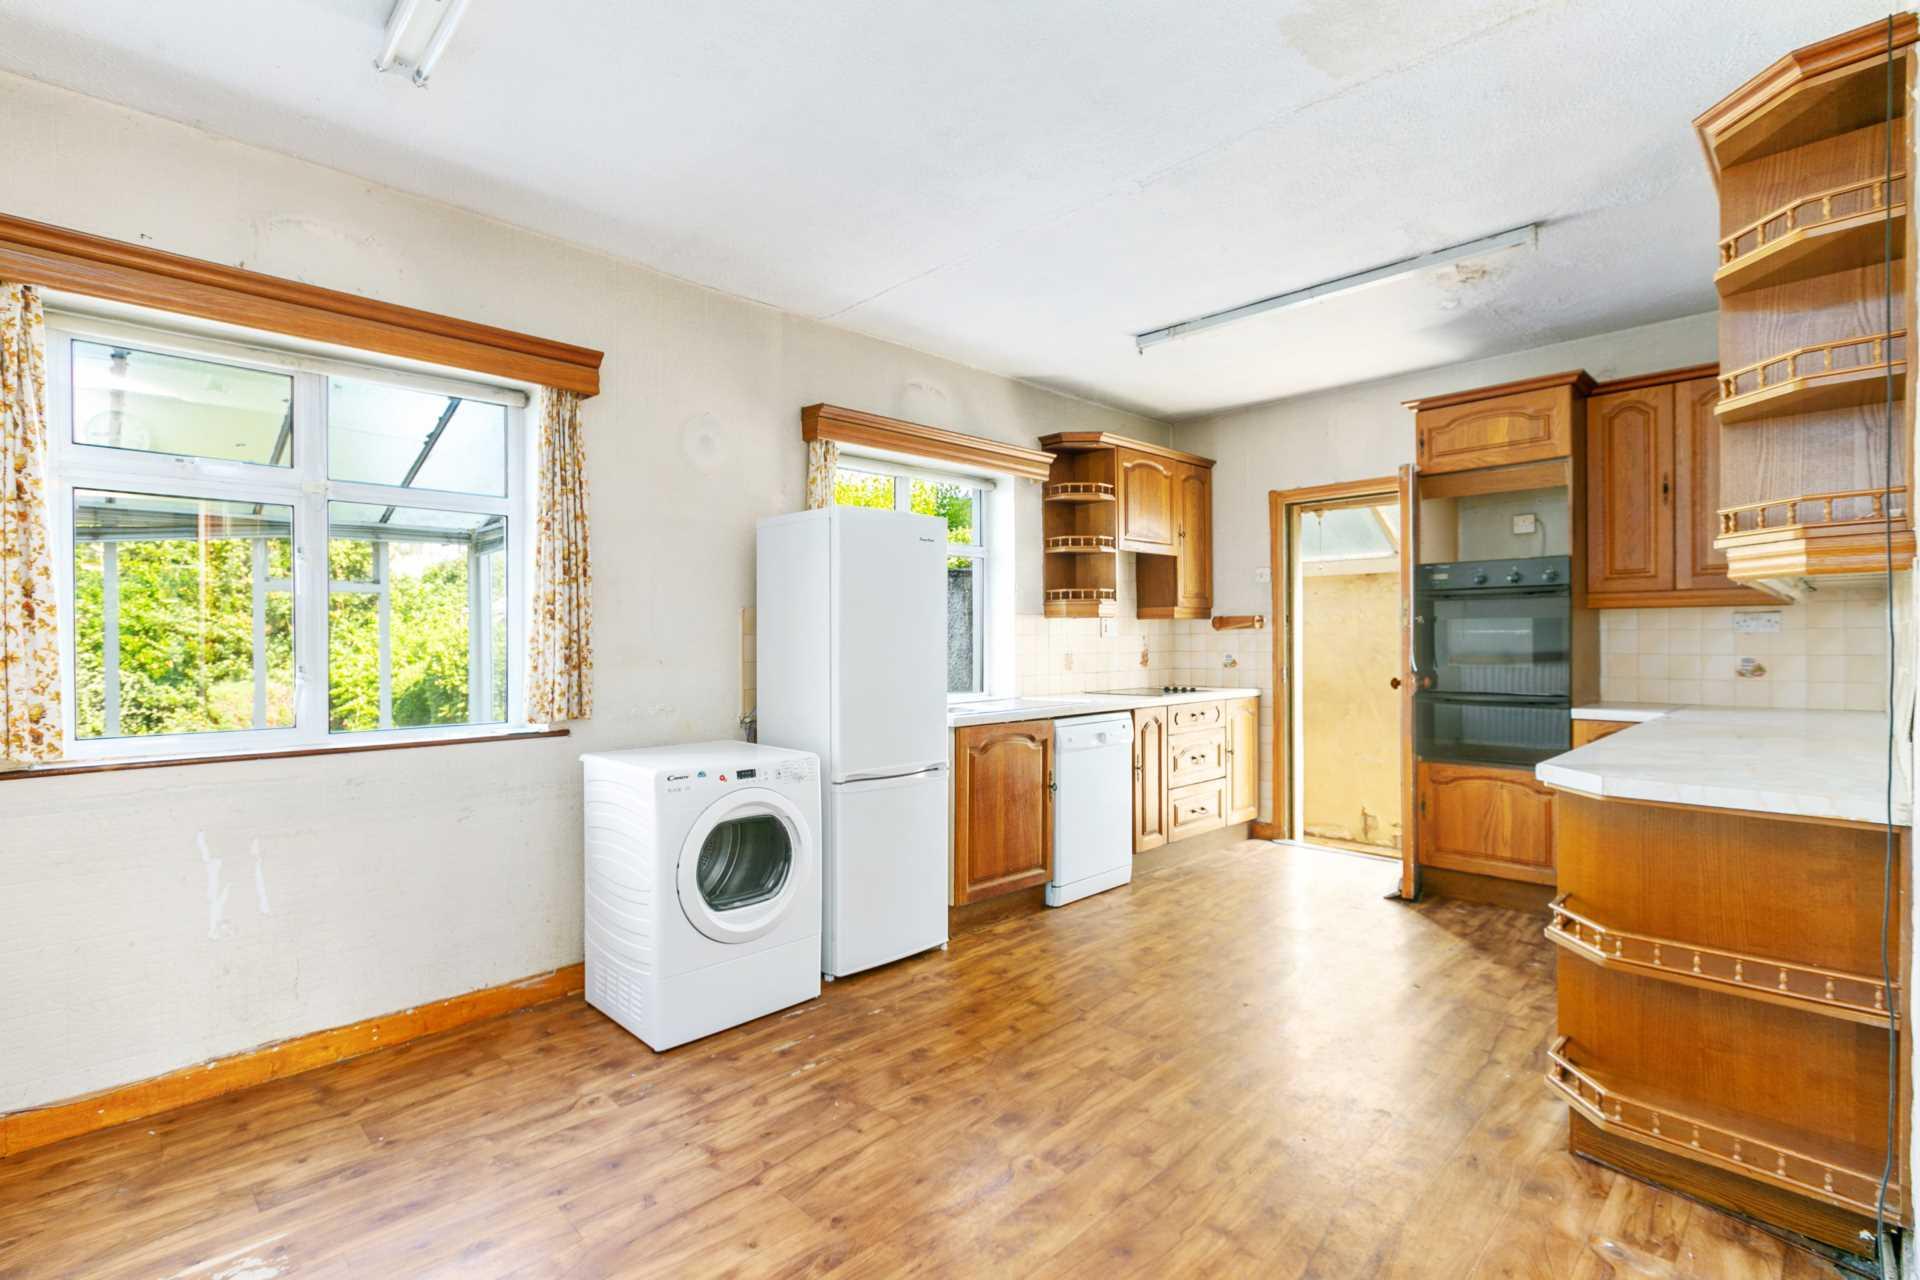 259 Templeogue Road, Templeogue, Dublin  6w, Image 6